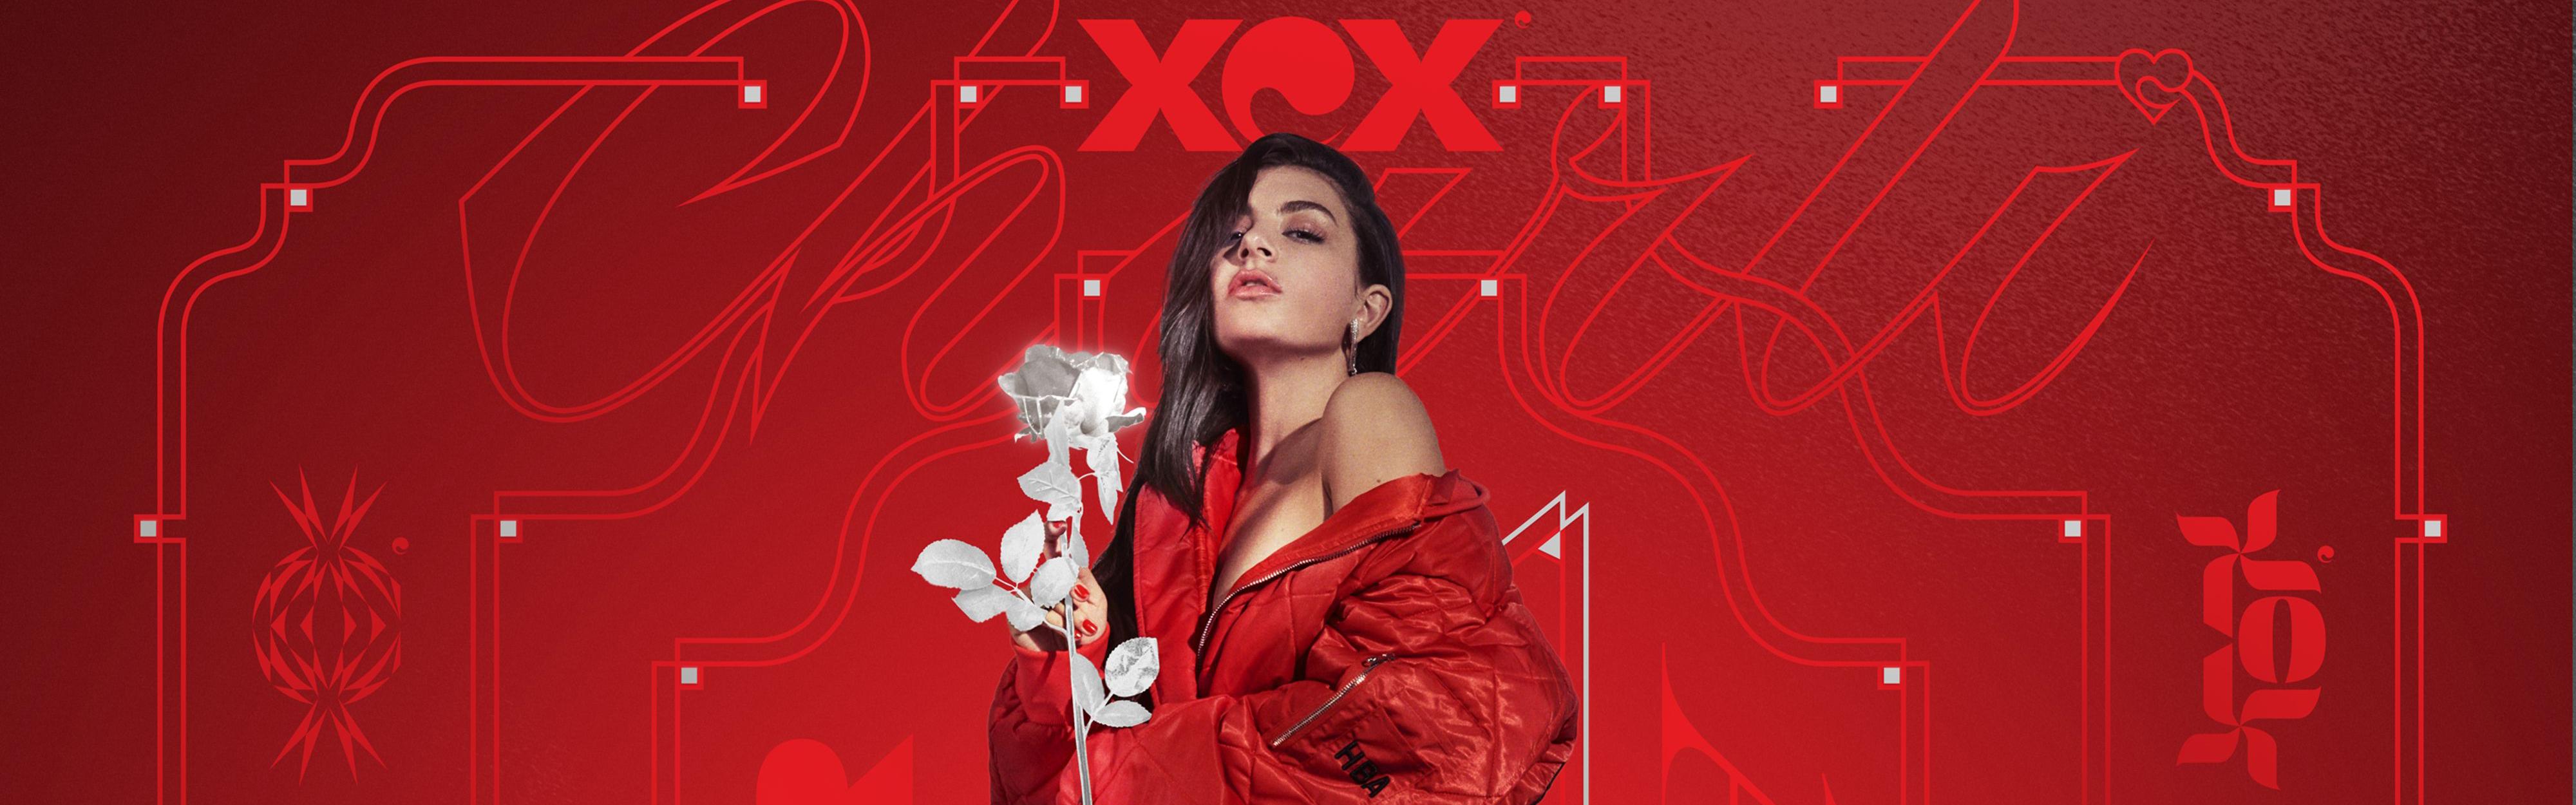 Charli xcx header